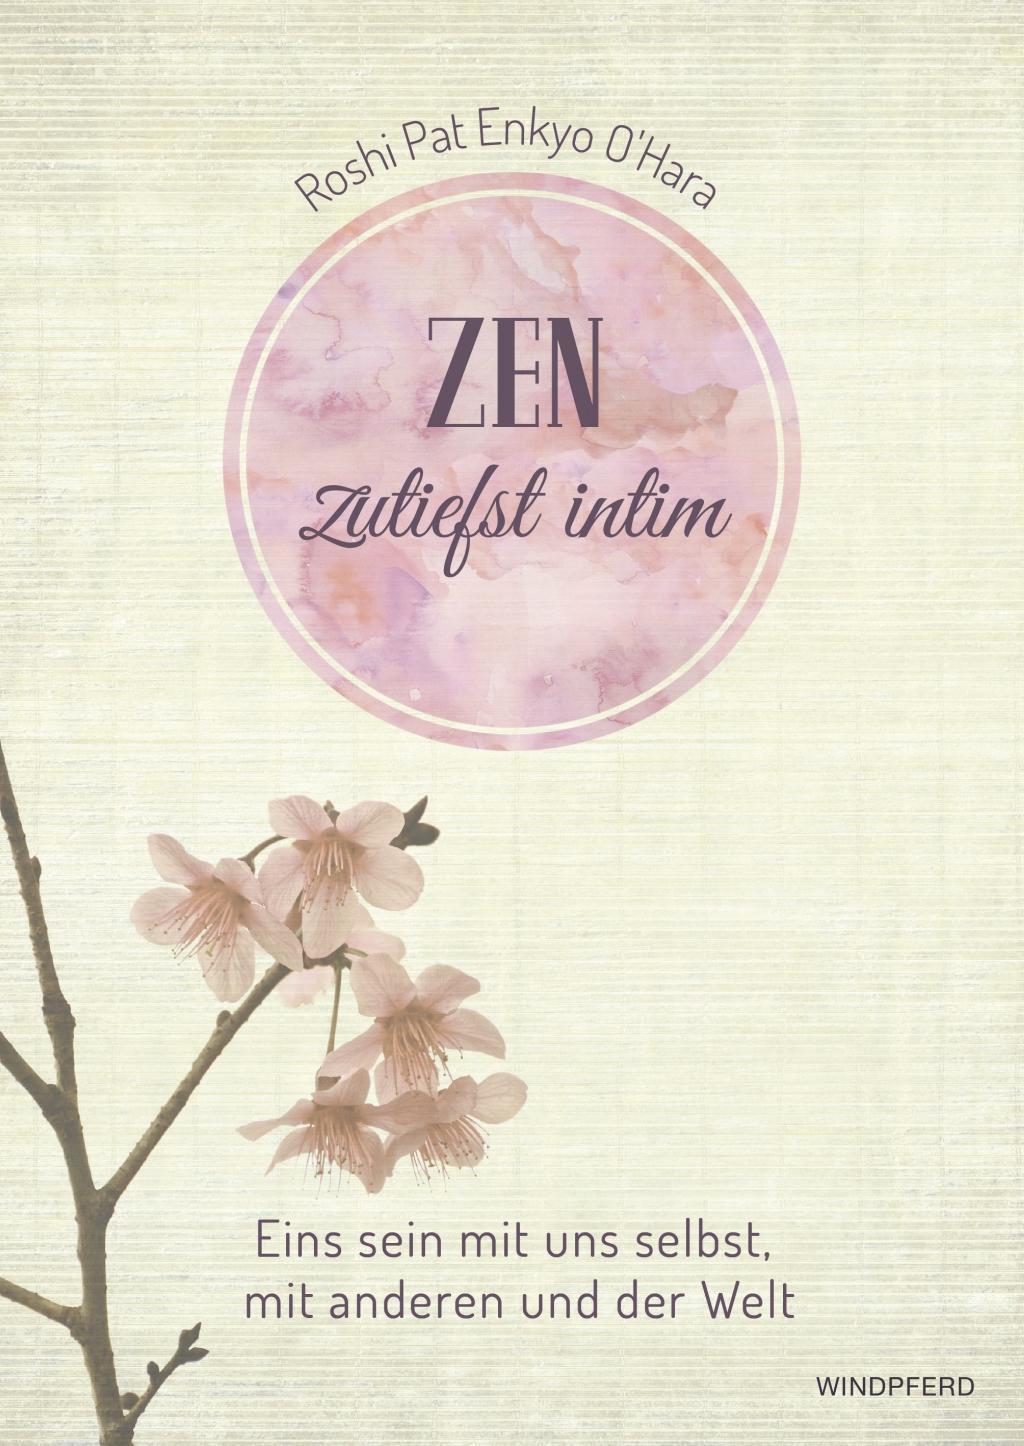 Zen zutiefst intim